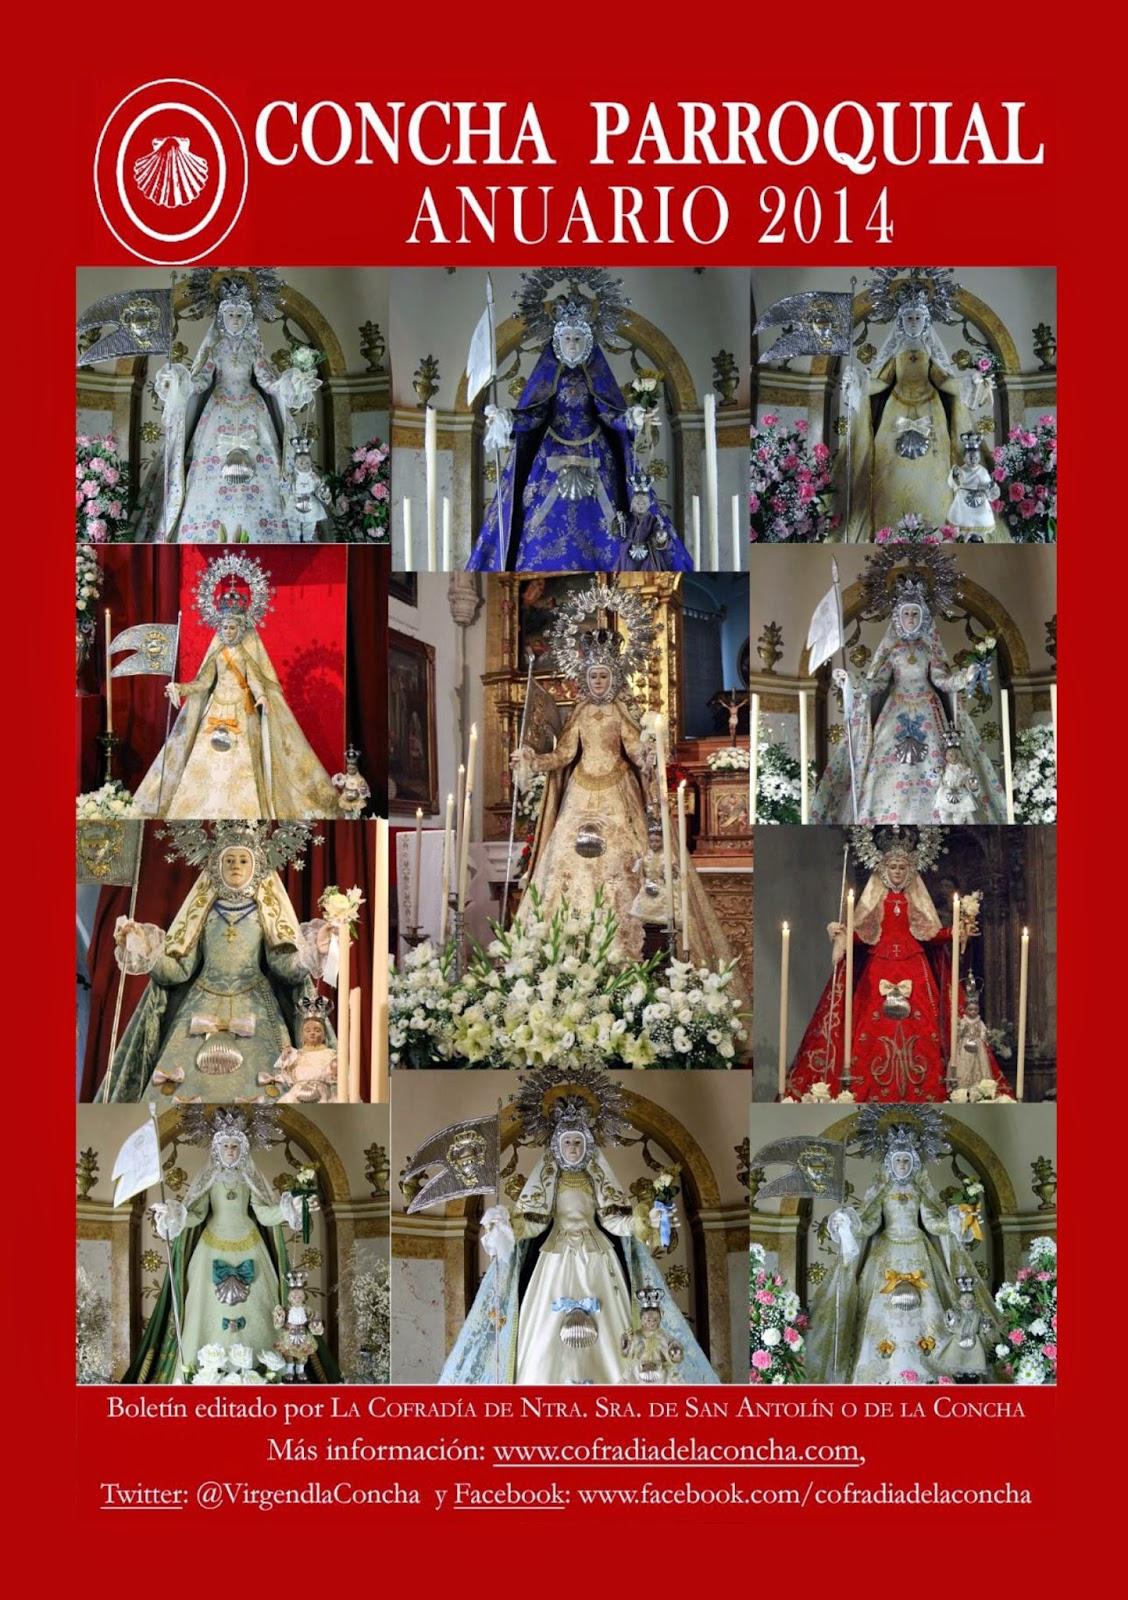 http://www.cofradiadelaconcha.com/boletines/Anuarios/ConchaParroquial2014.pdf